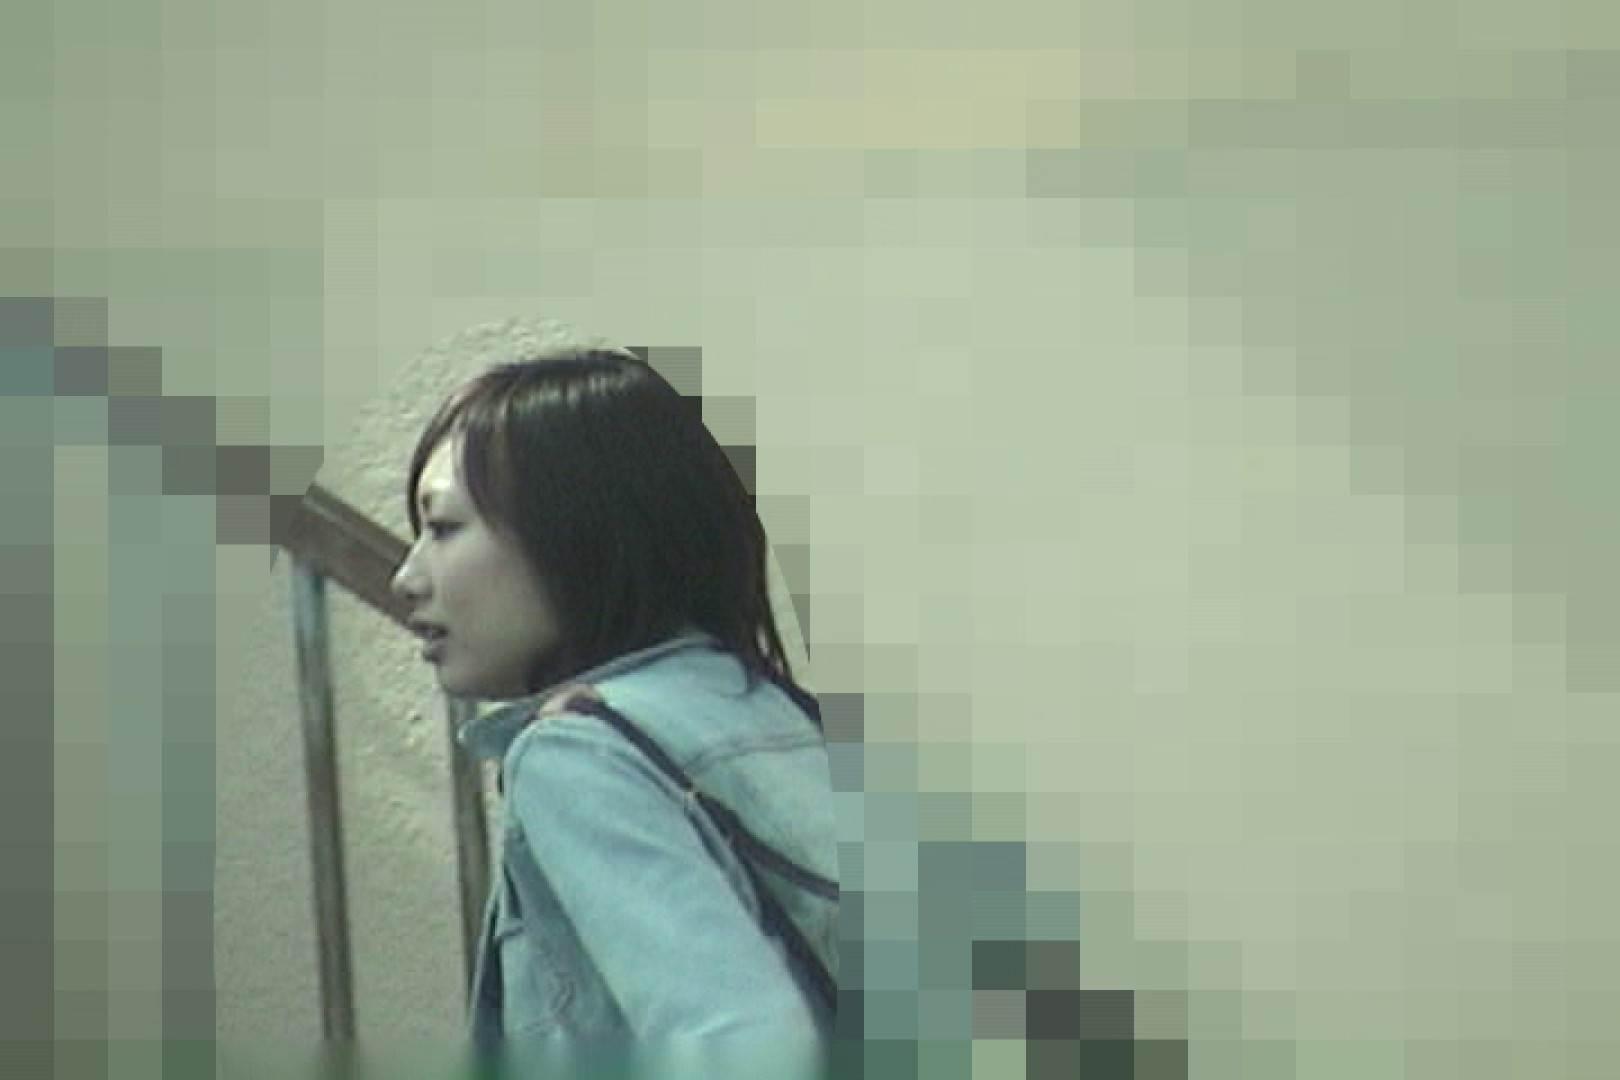 Aquaな露天風呂Vol.58【VIP限定】 0 | 0  71連発 3